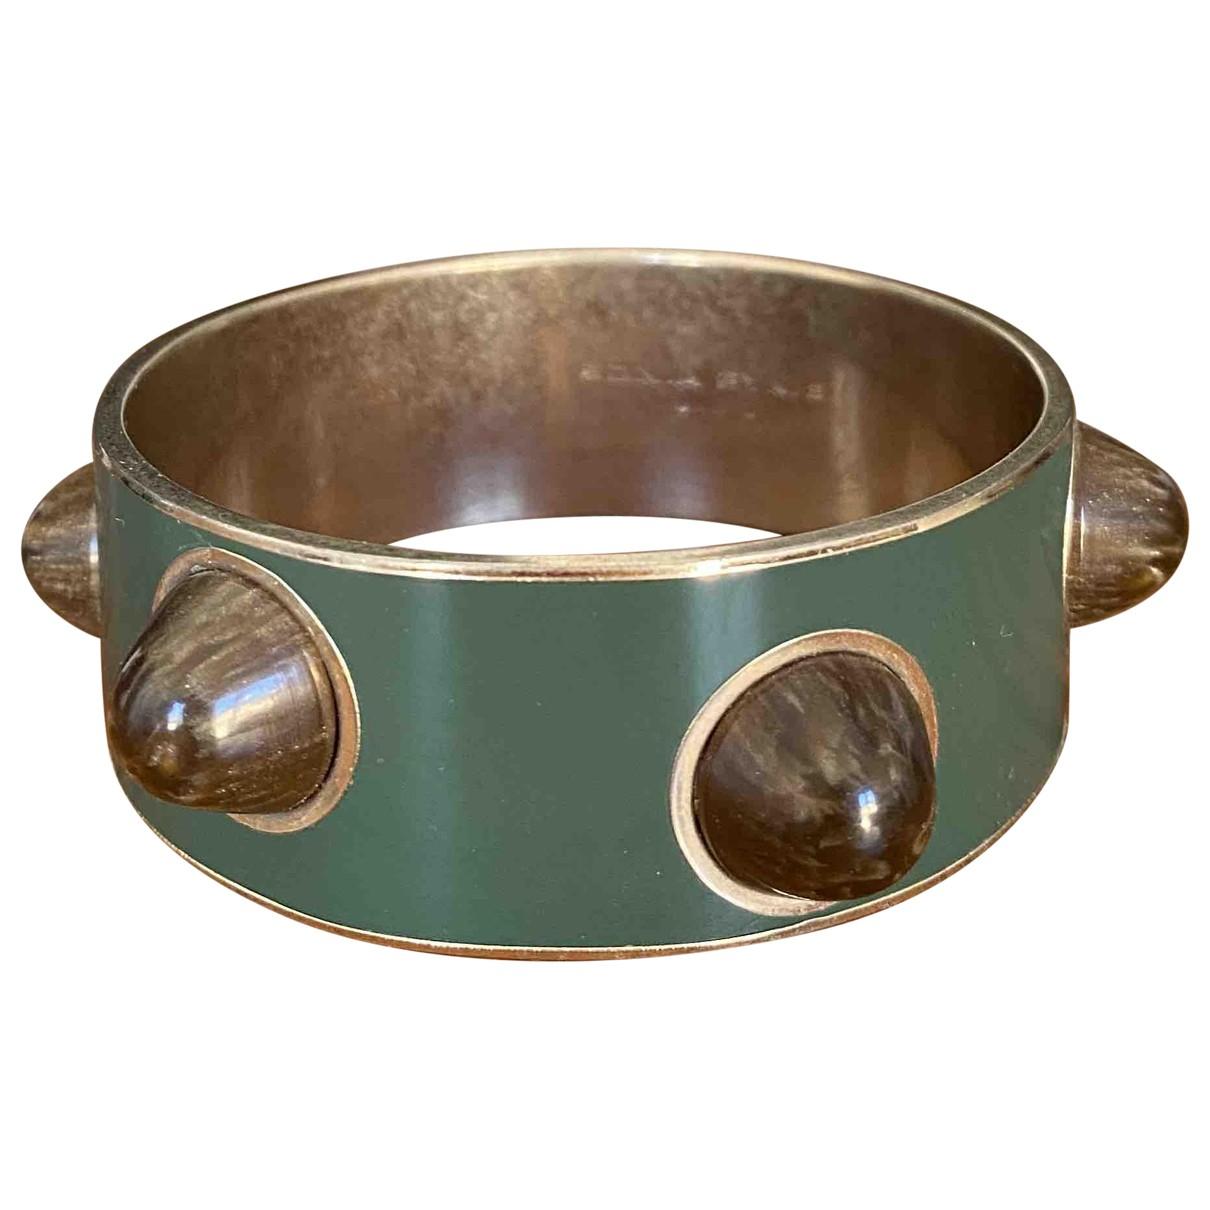 Sonia Rykiel \N Armband in  Khaki Metall